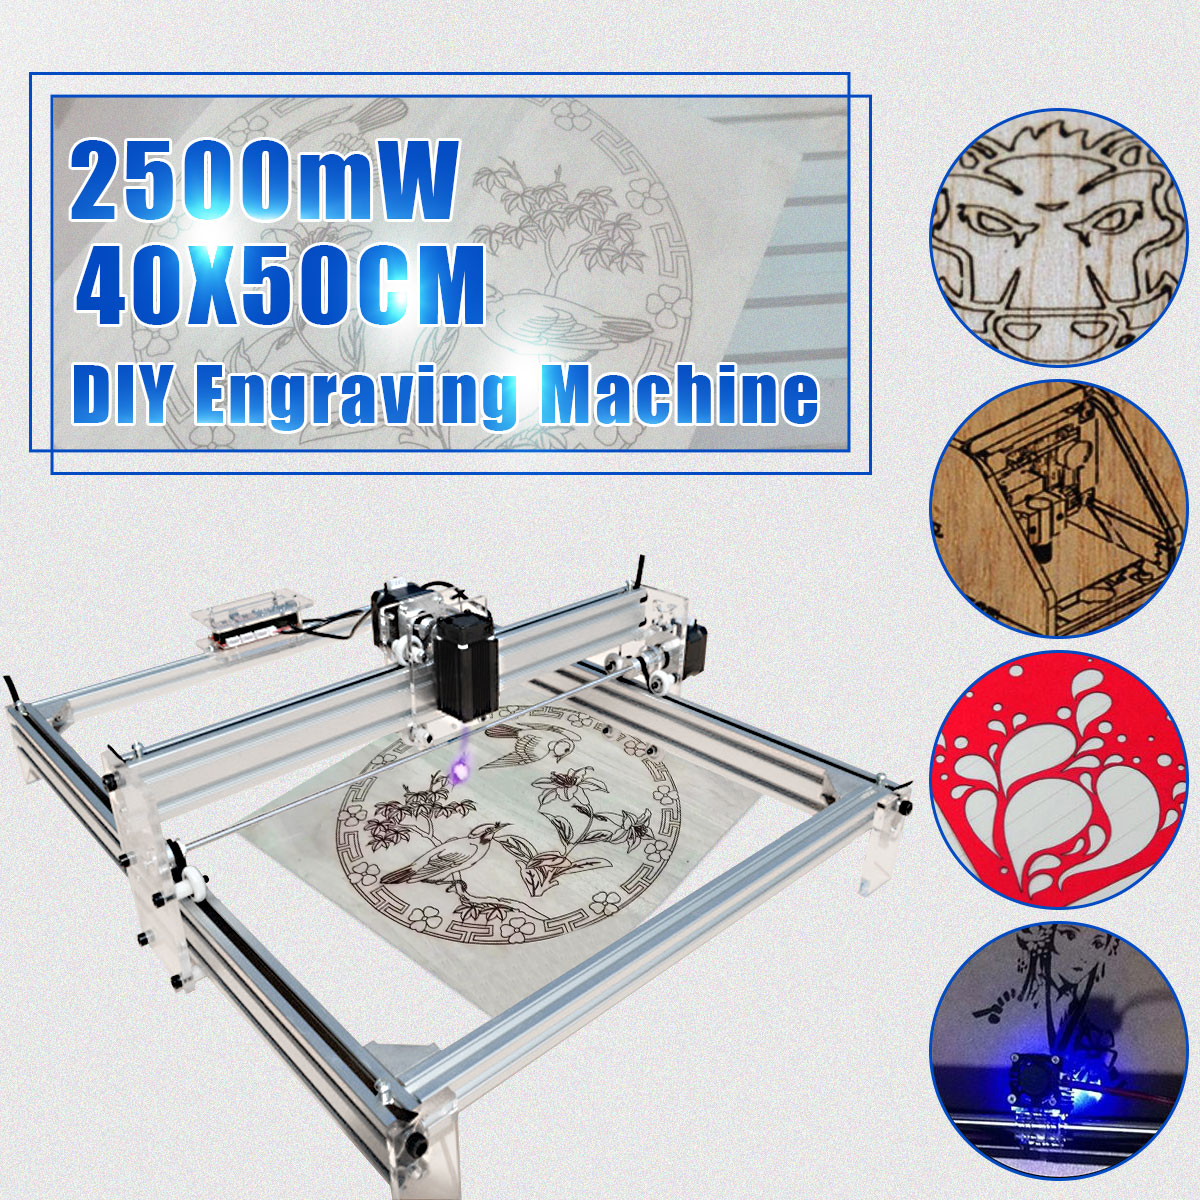 DC 12V 2500mW 40X50CM DIY Desktop Mini Laser Cutting/Engraving Machine Printer Carving with Laser Goggles